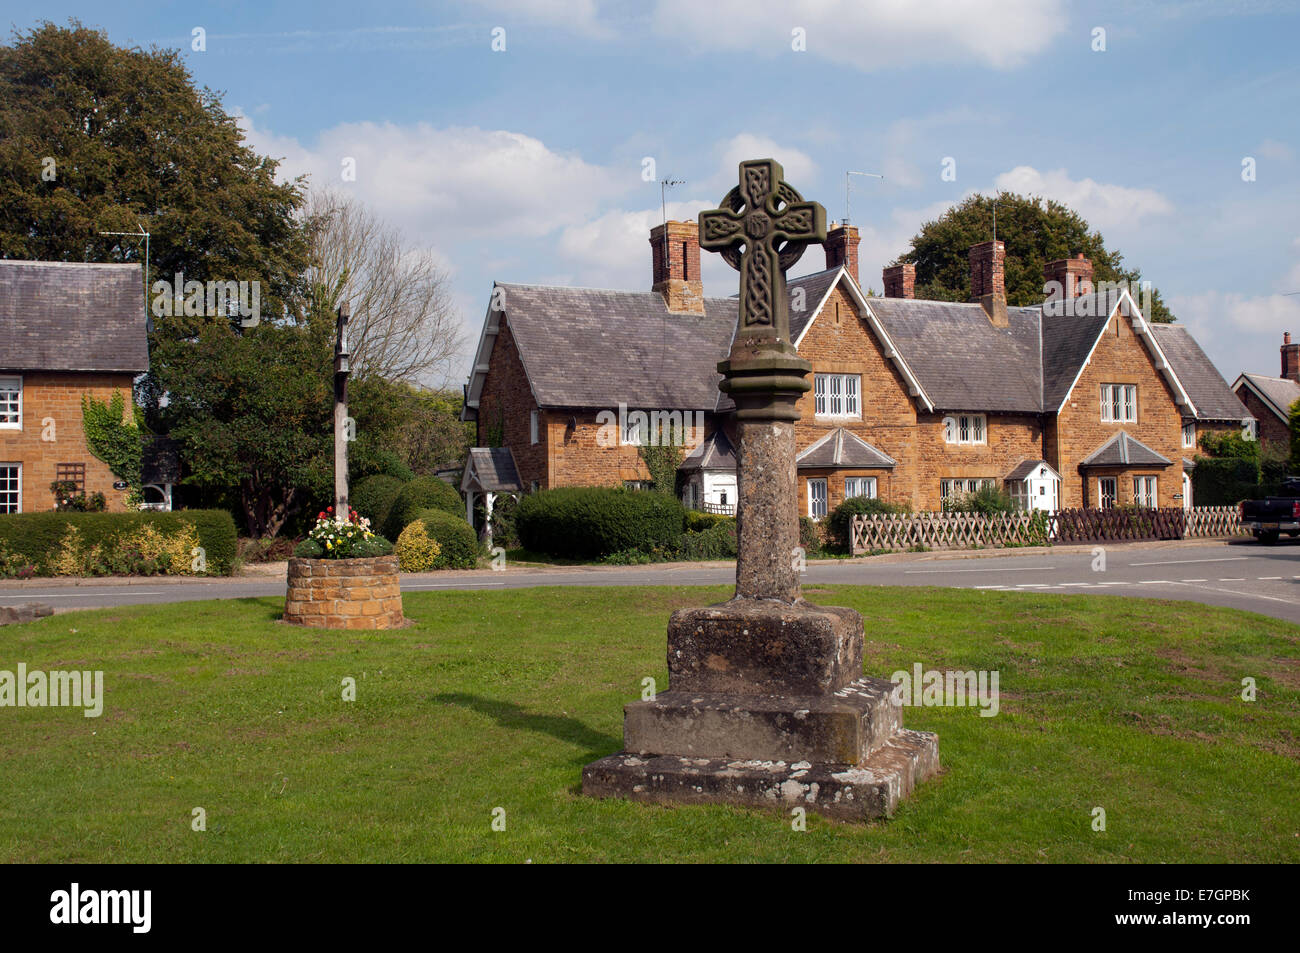 Sywell village, Northamptonshire, England, UK - Stock Image